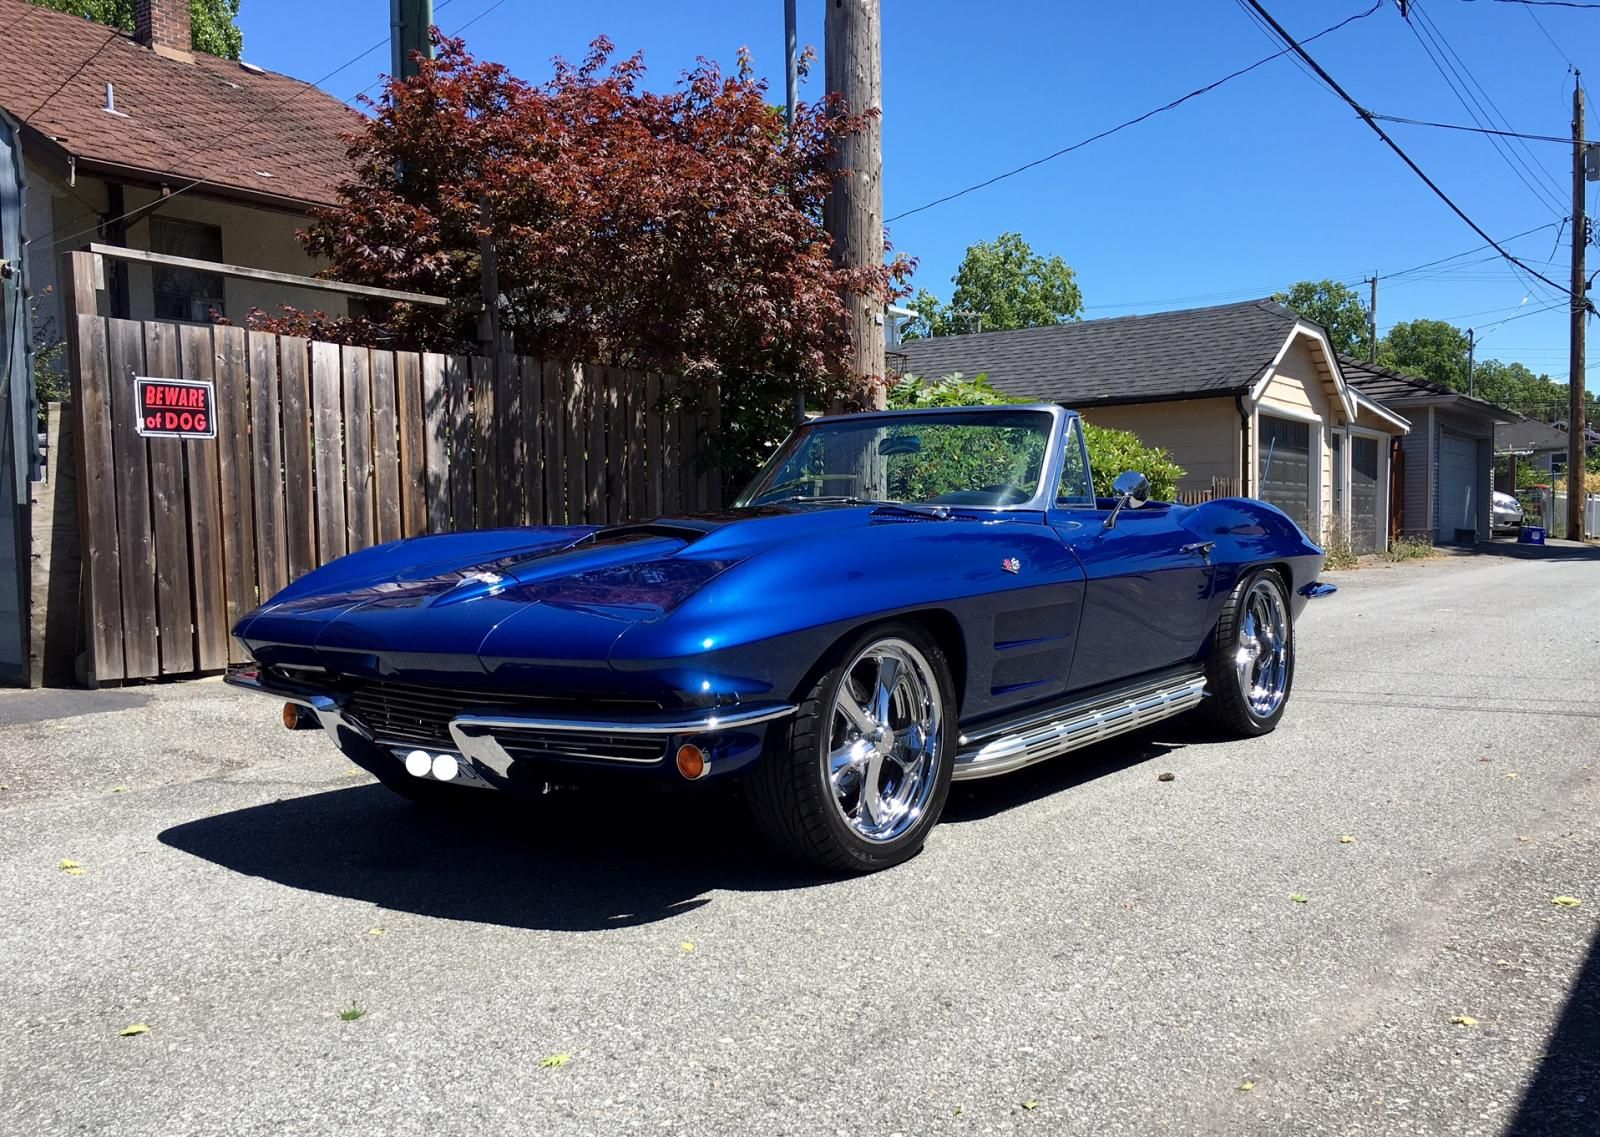 1964 corvette stingray convertible restomod frame off restoration for sale